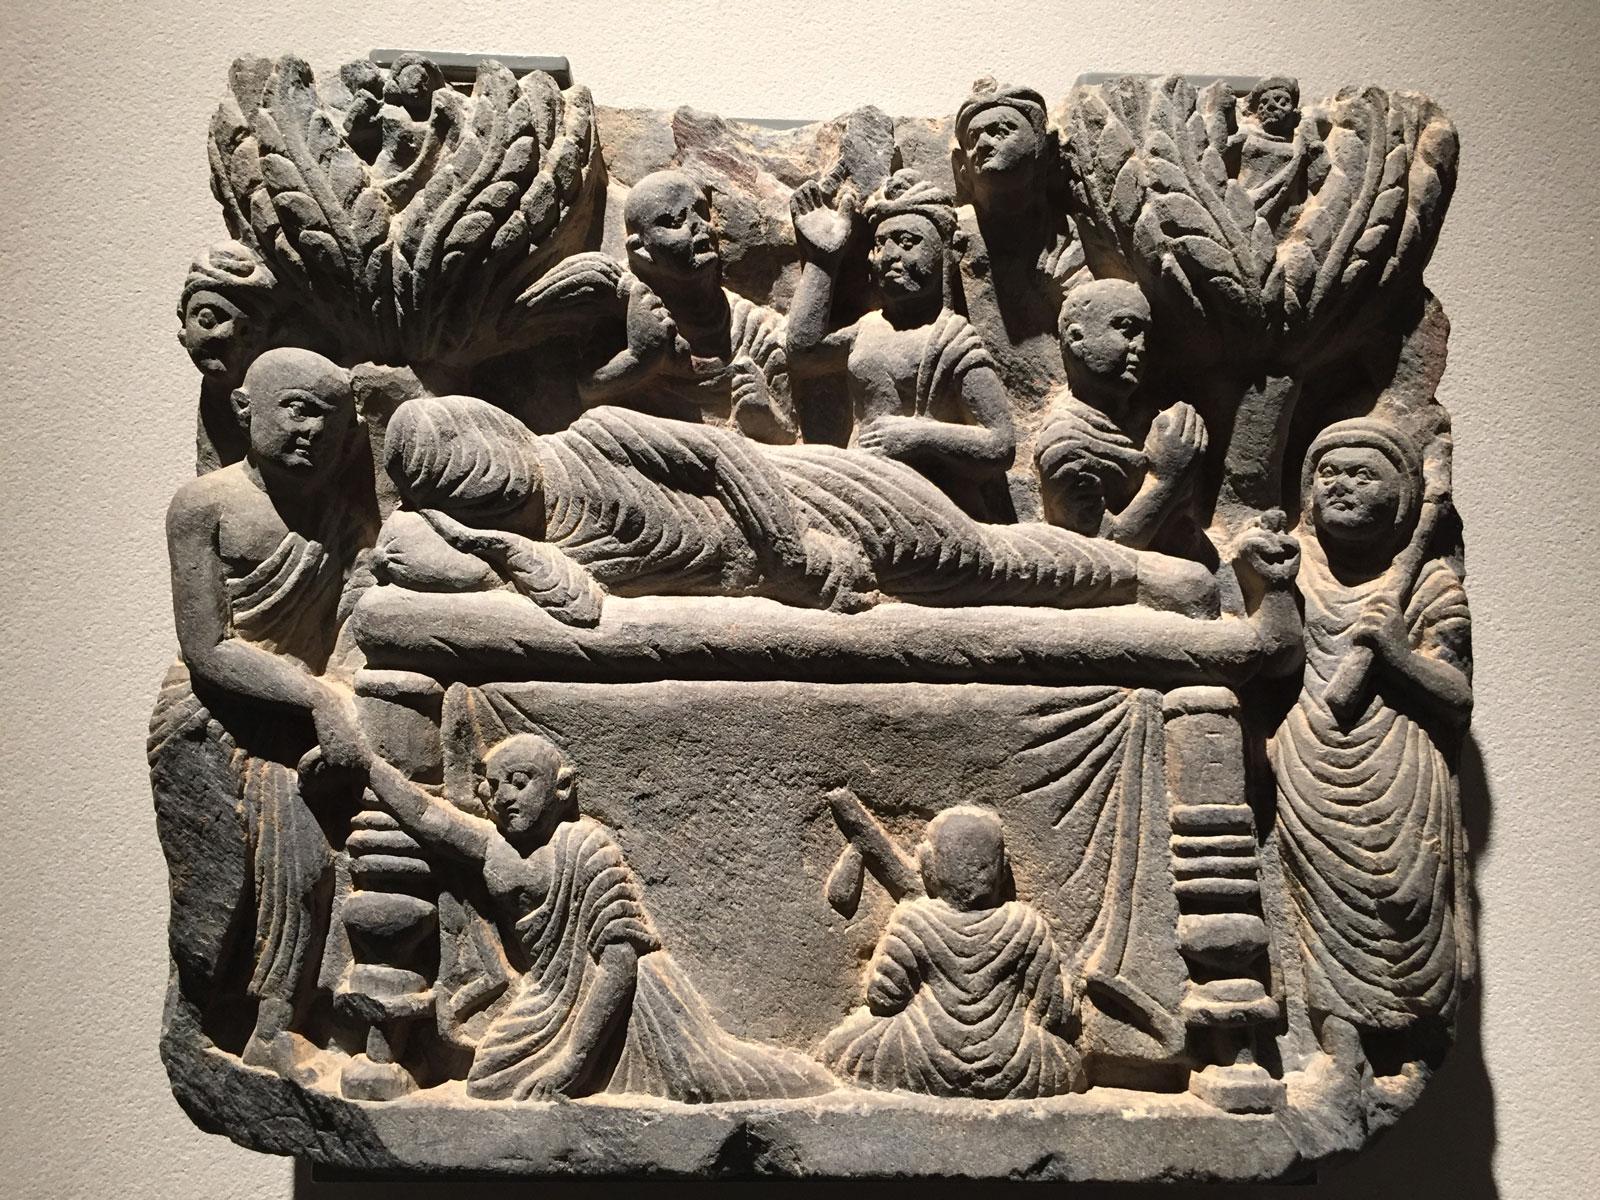 Parinirvāna of the Buddha, Gandhara, third century AD